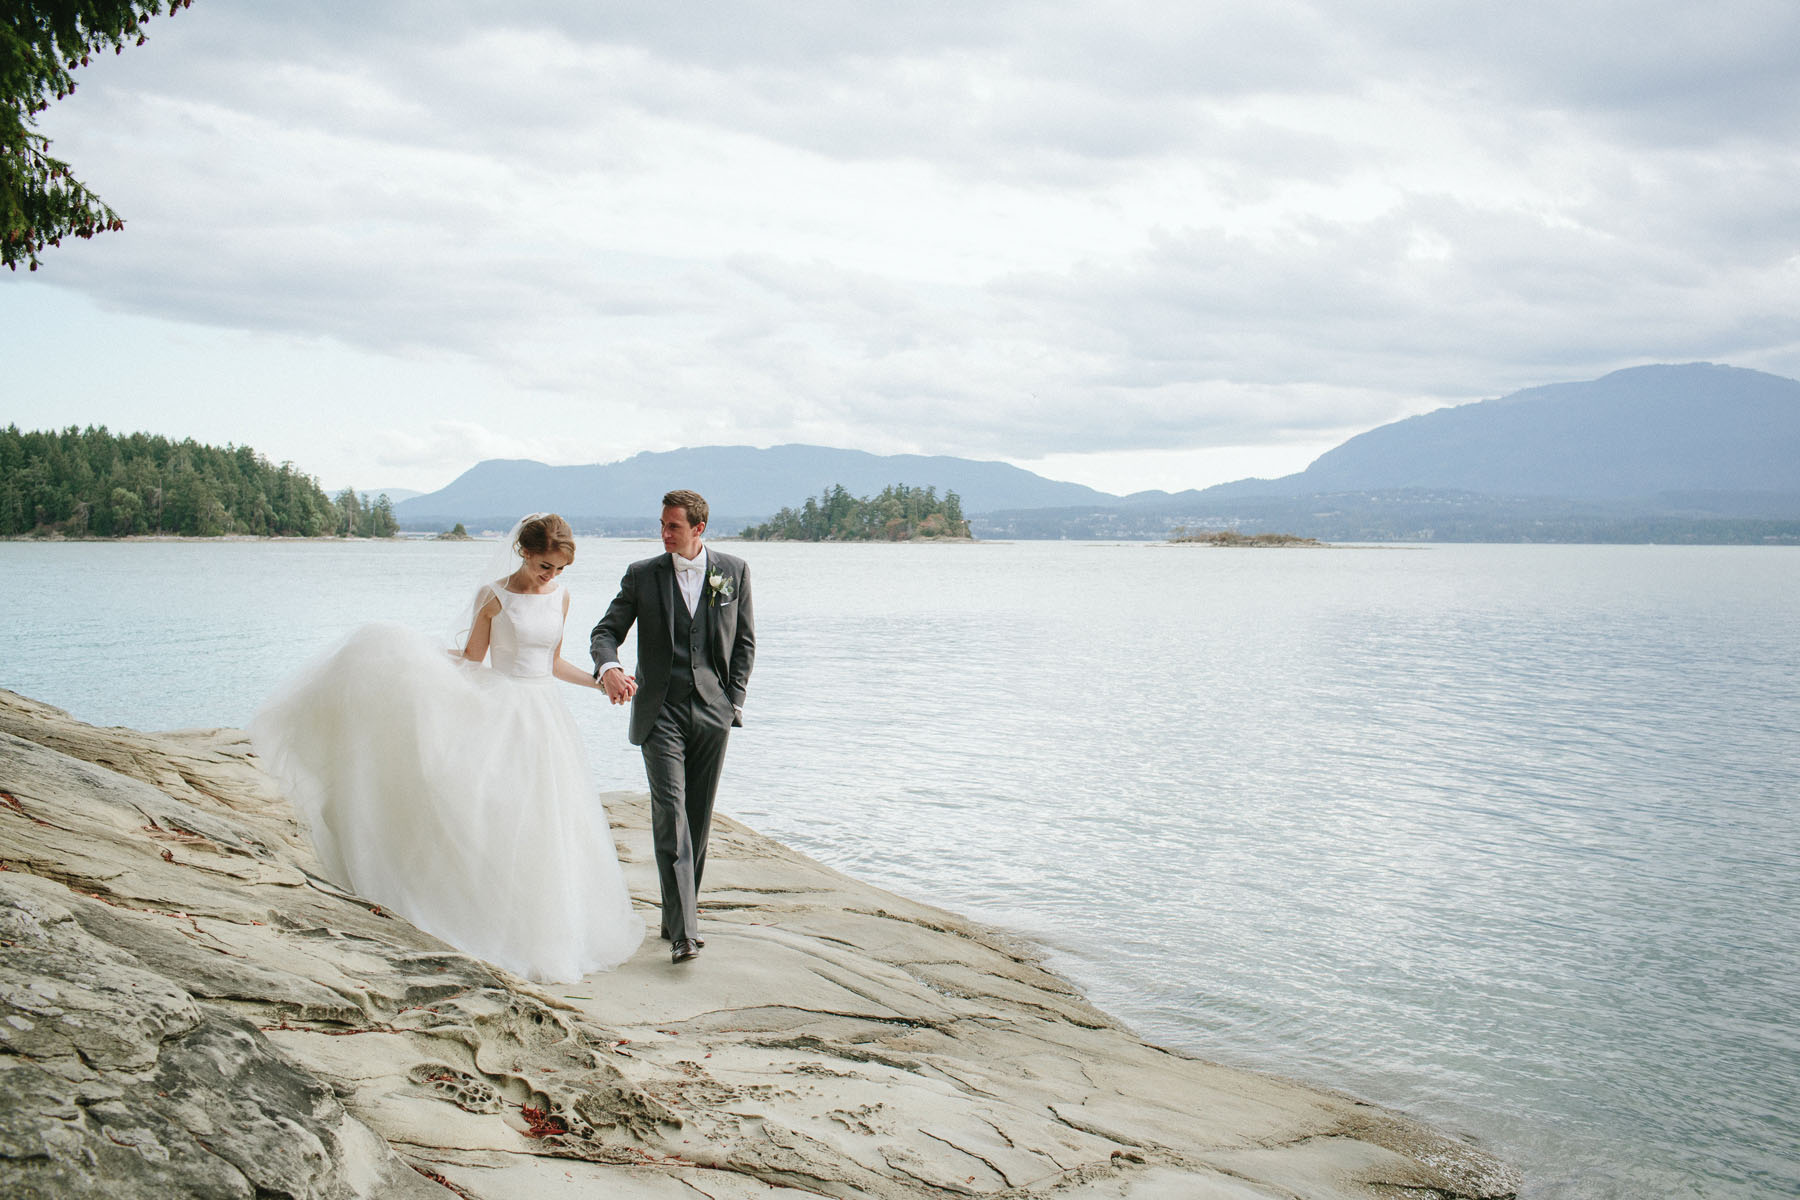 thetis-island-wedding-photographer-rp-rn-117.jpg